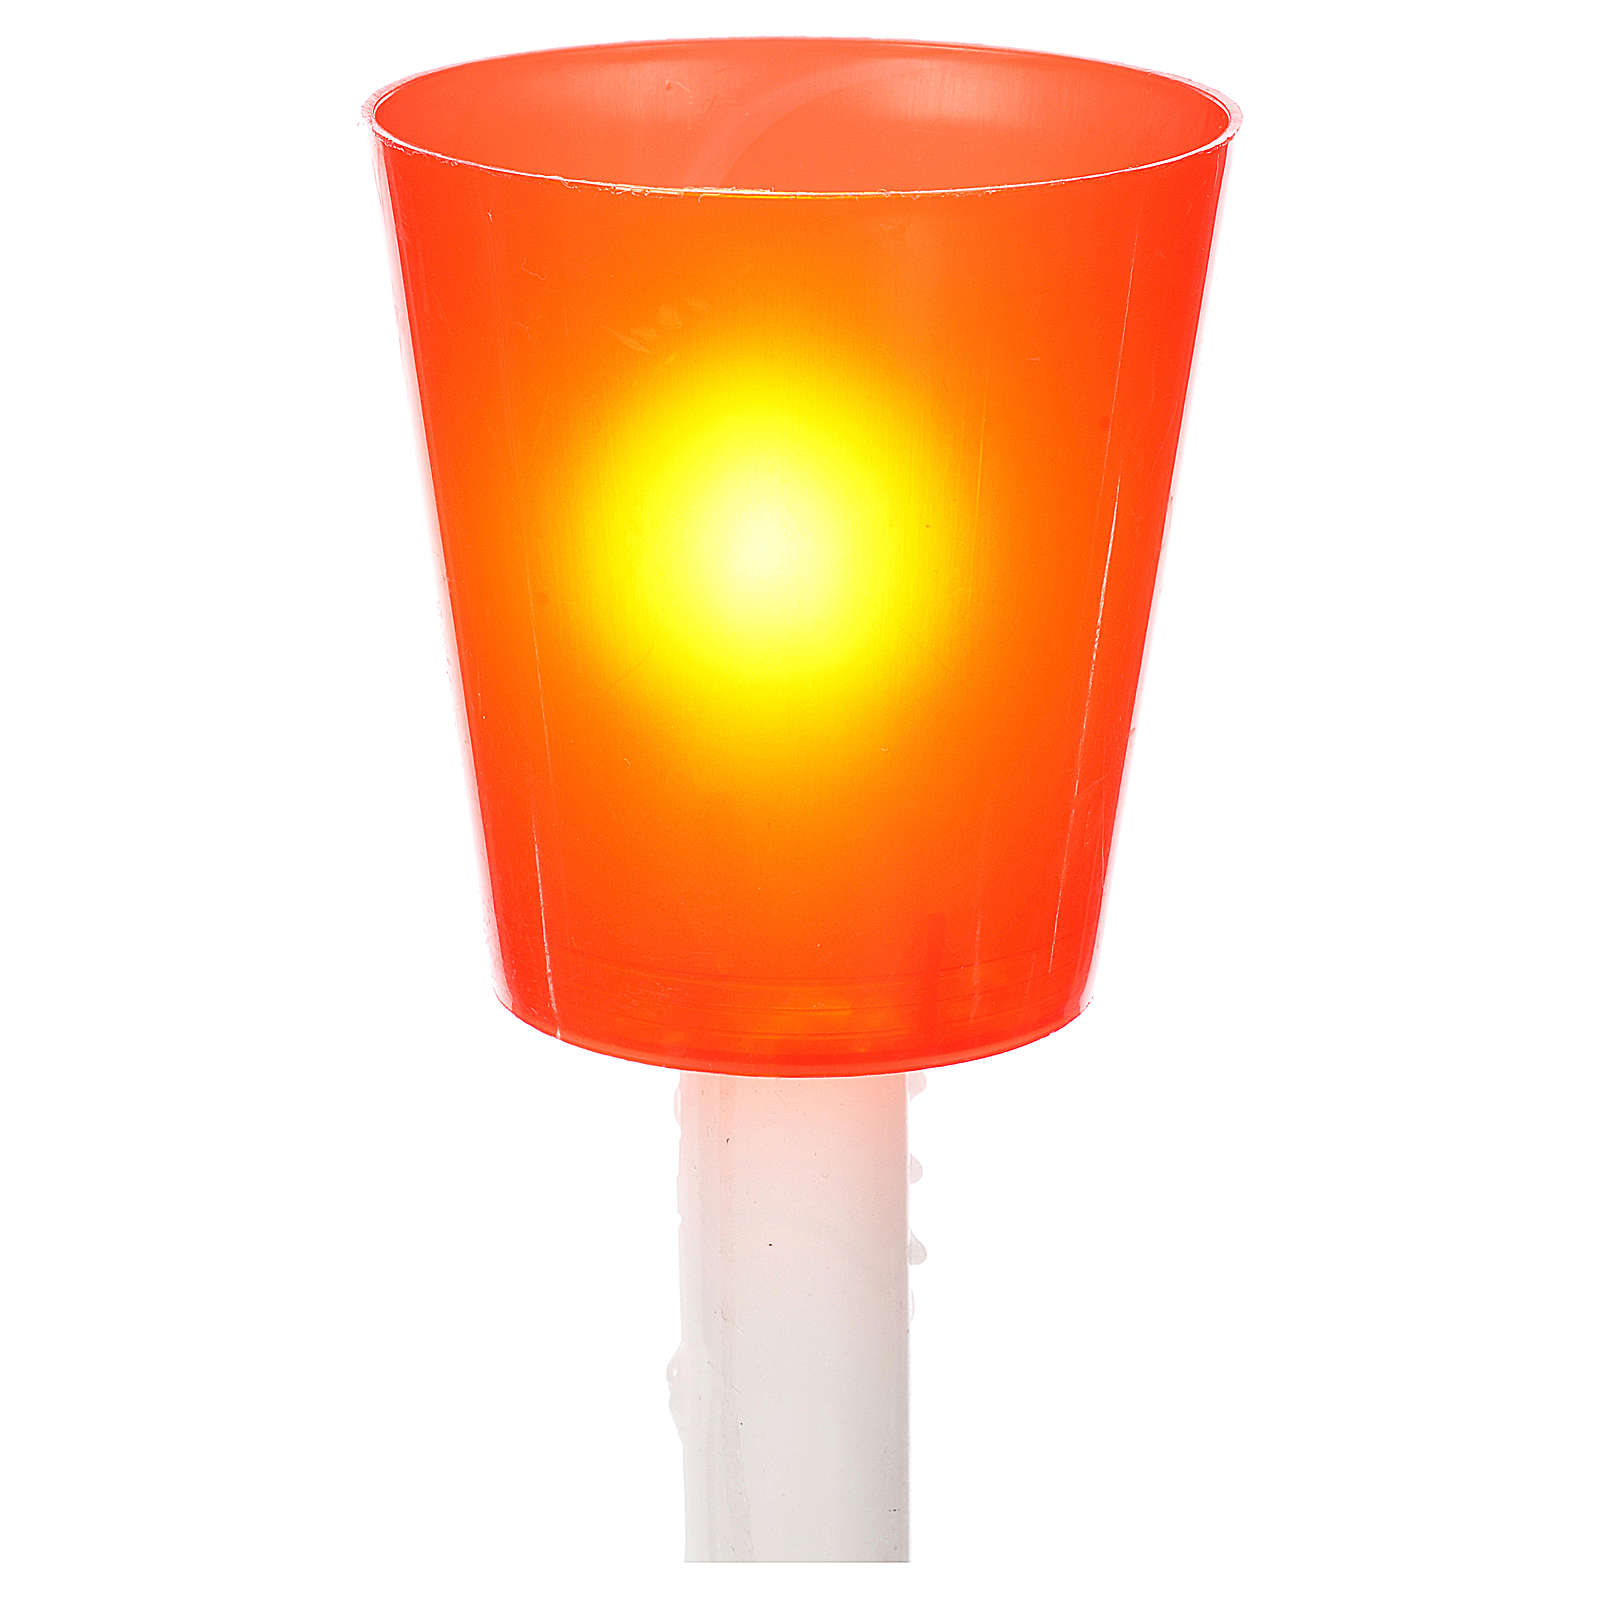 Flambeaux aus bunten Plastik (30St.) 3